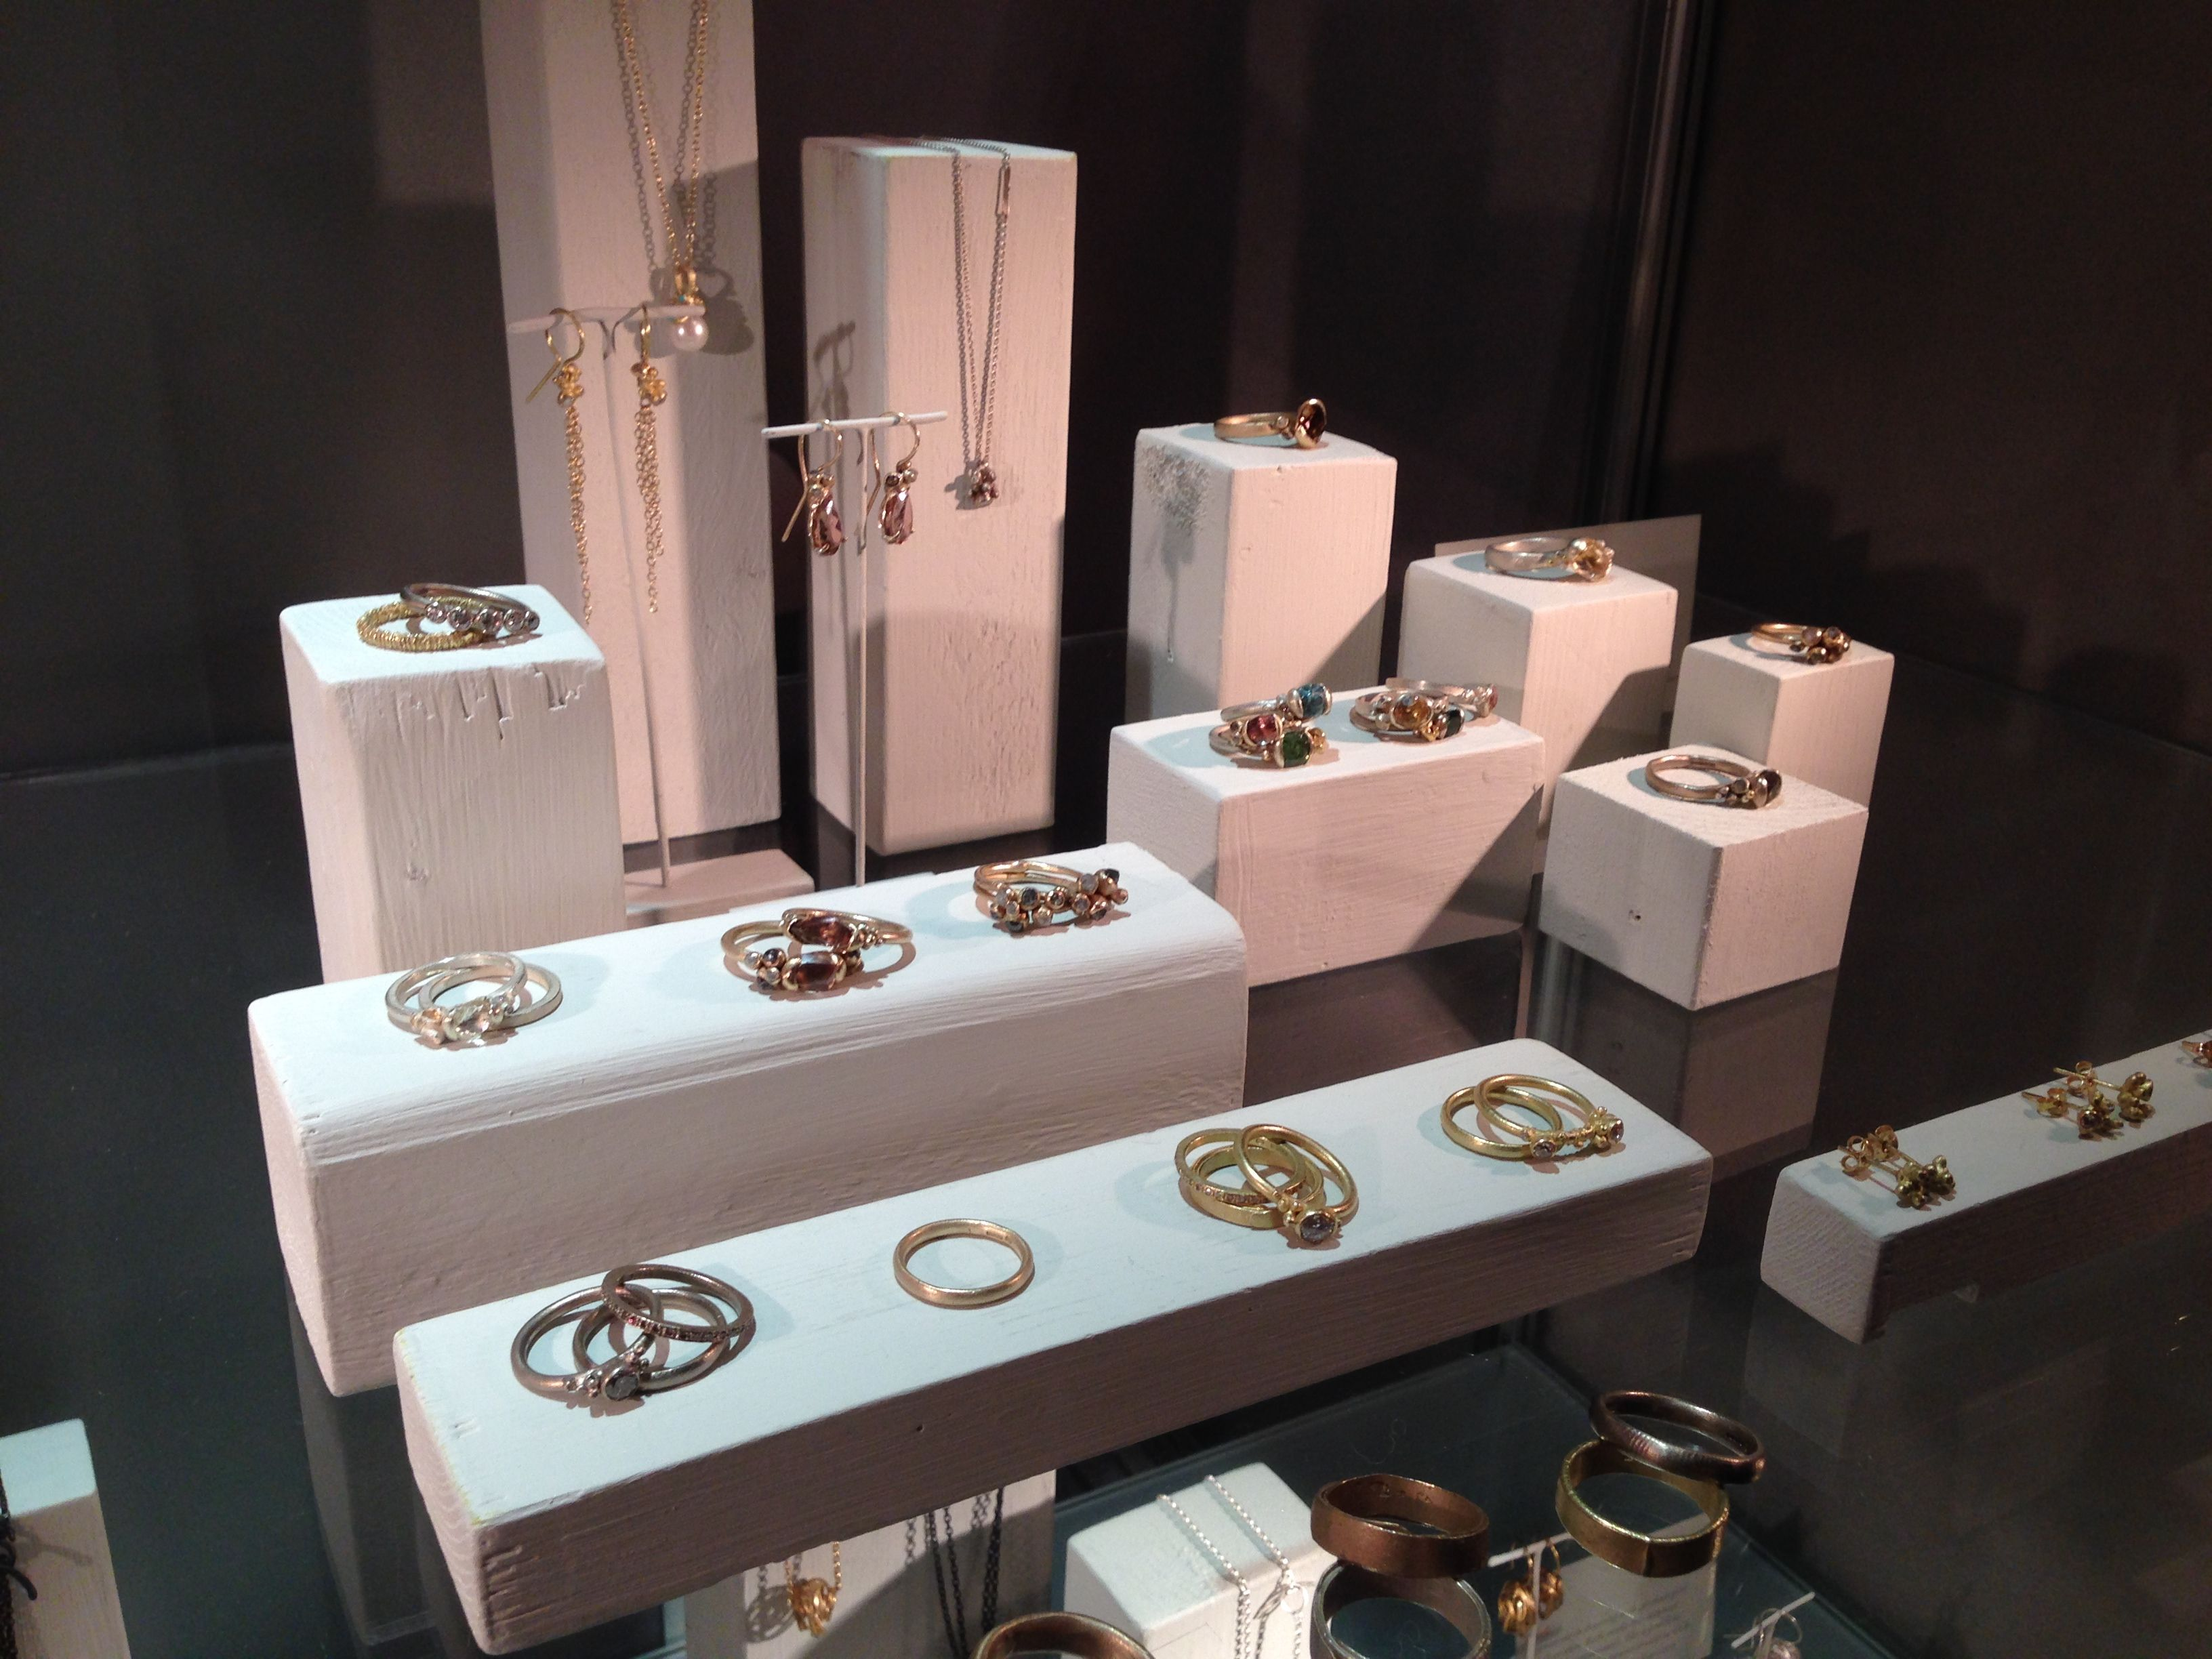 Window display ideas for jewelry  ruth tomlinson  displays art  pinterest  display jewellery